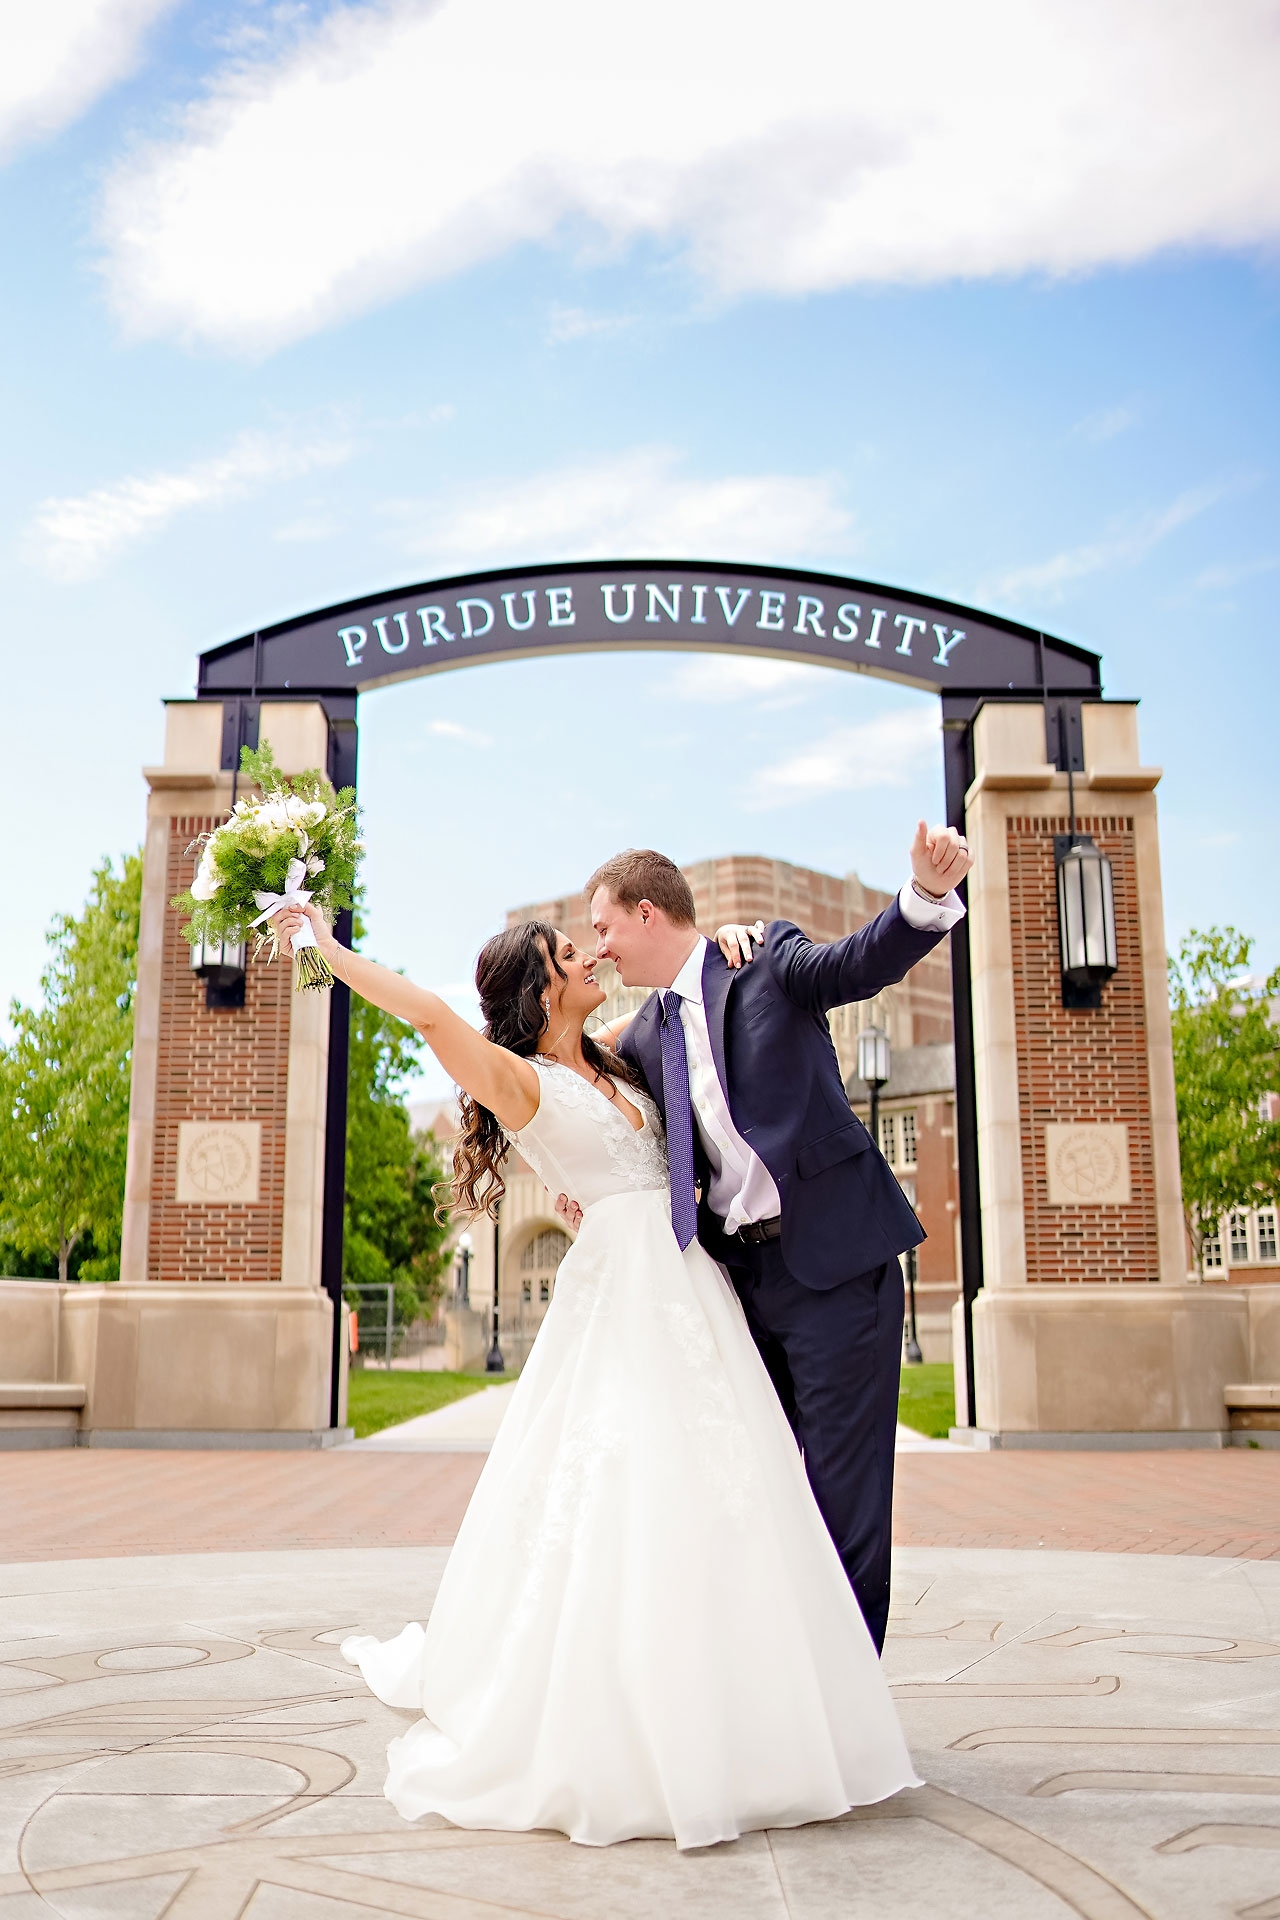 MacKinze John Lafayette Indiana Purdue Wedding 122